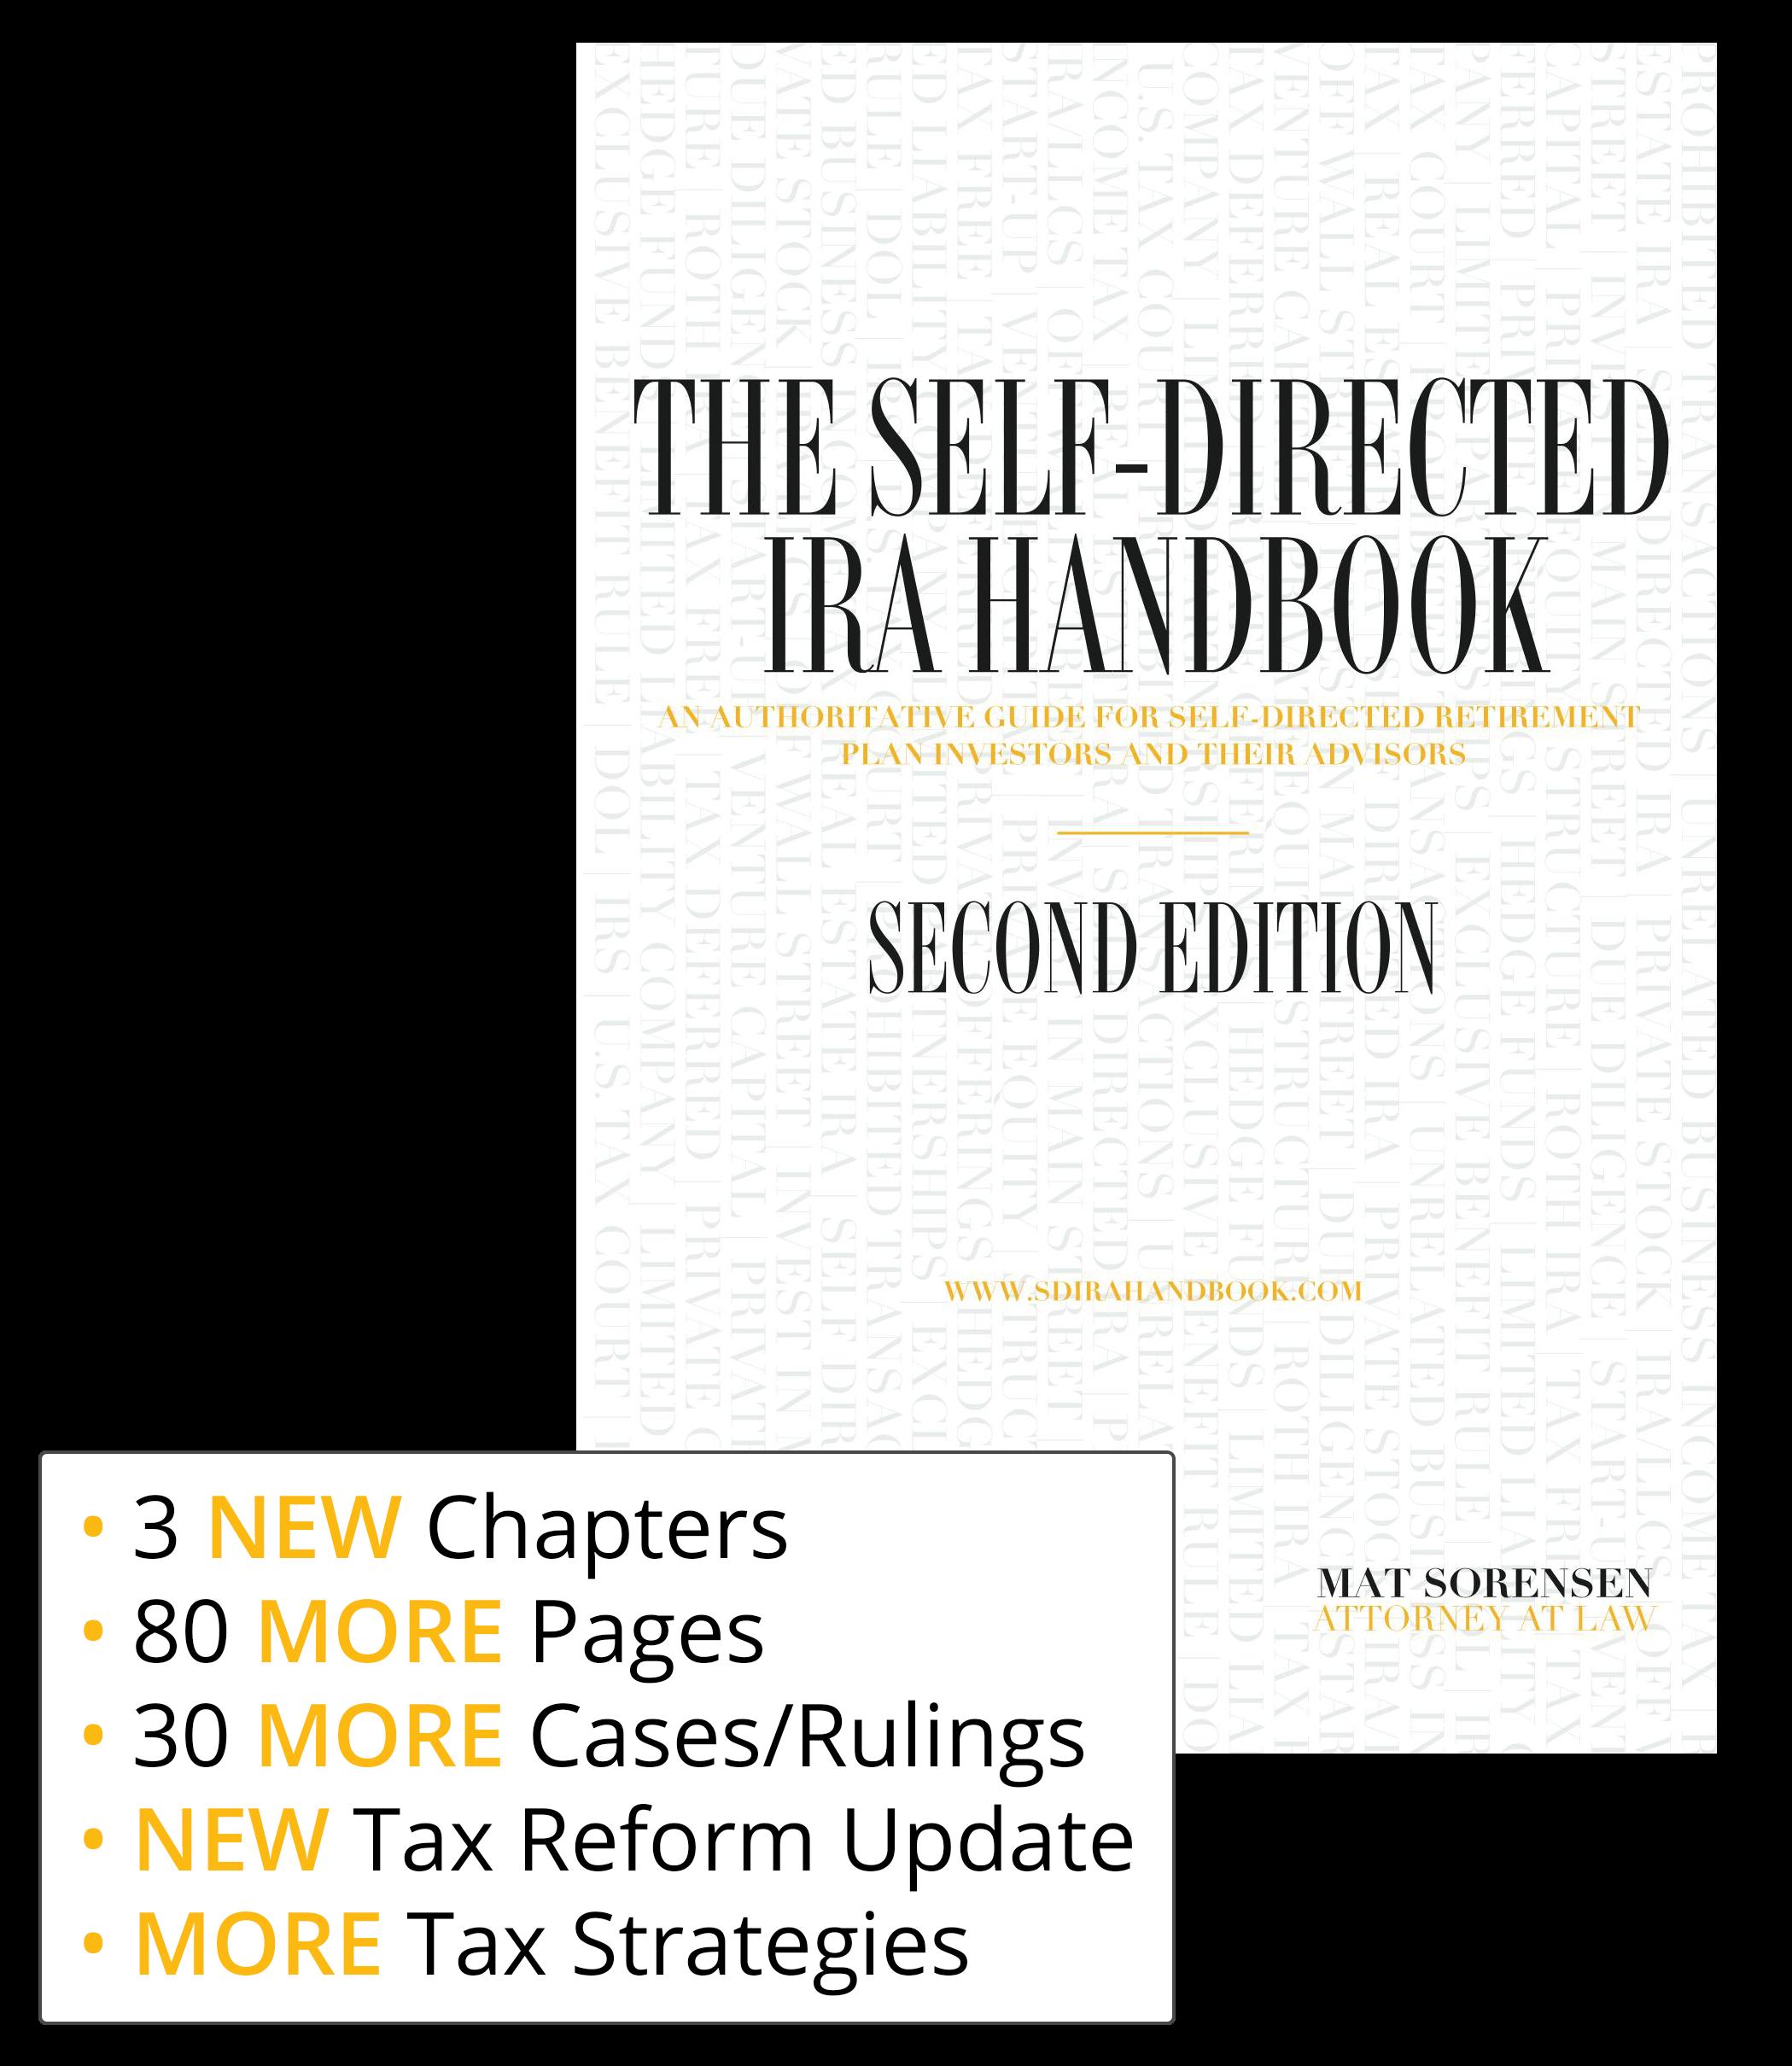 The Self Directed IRA Handbook